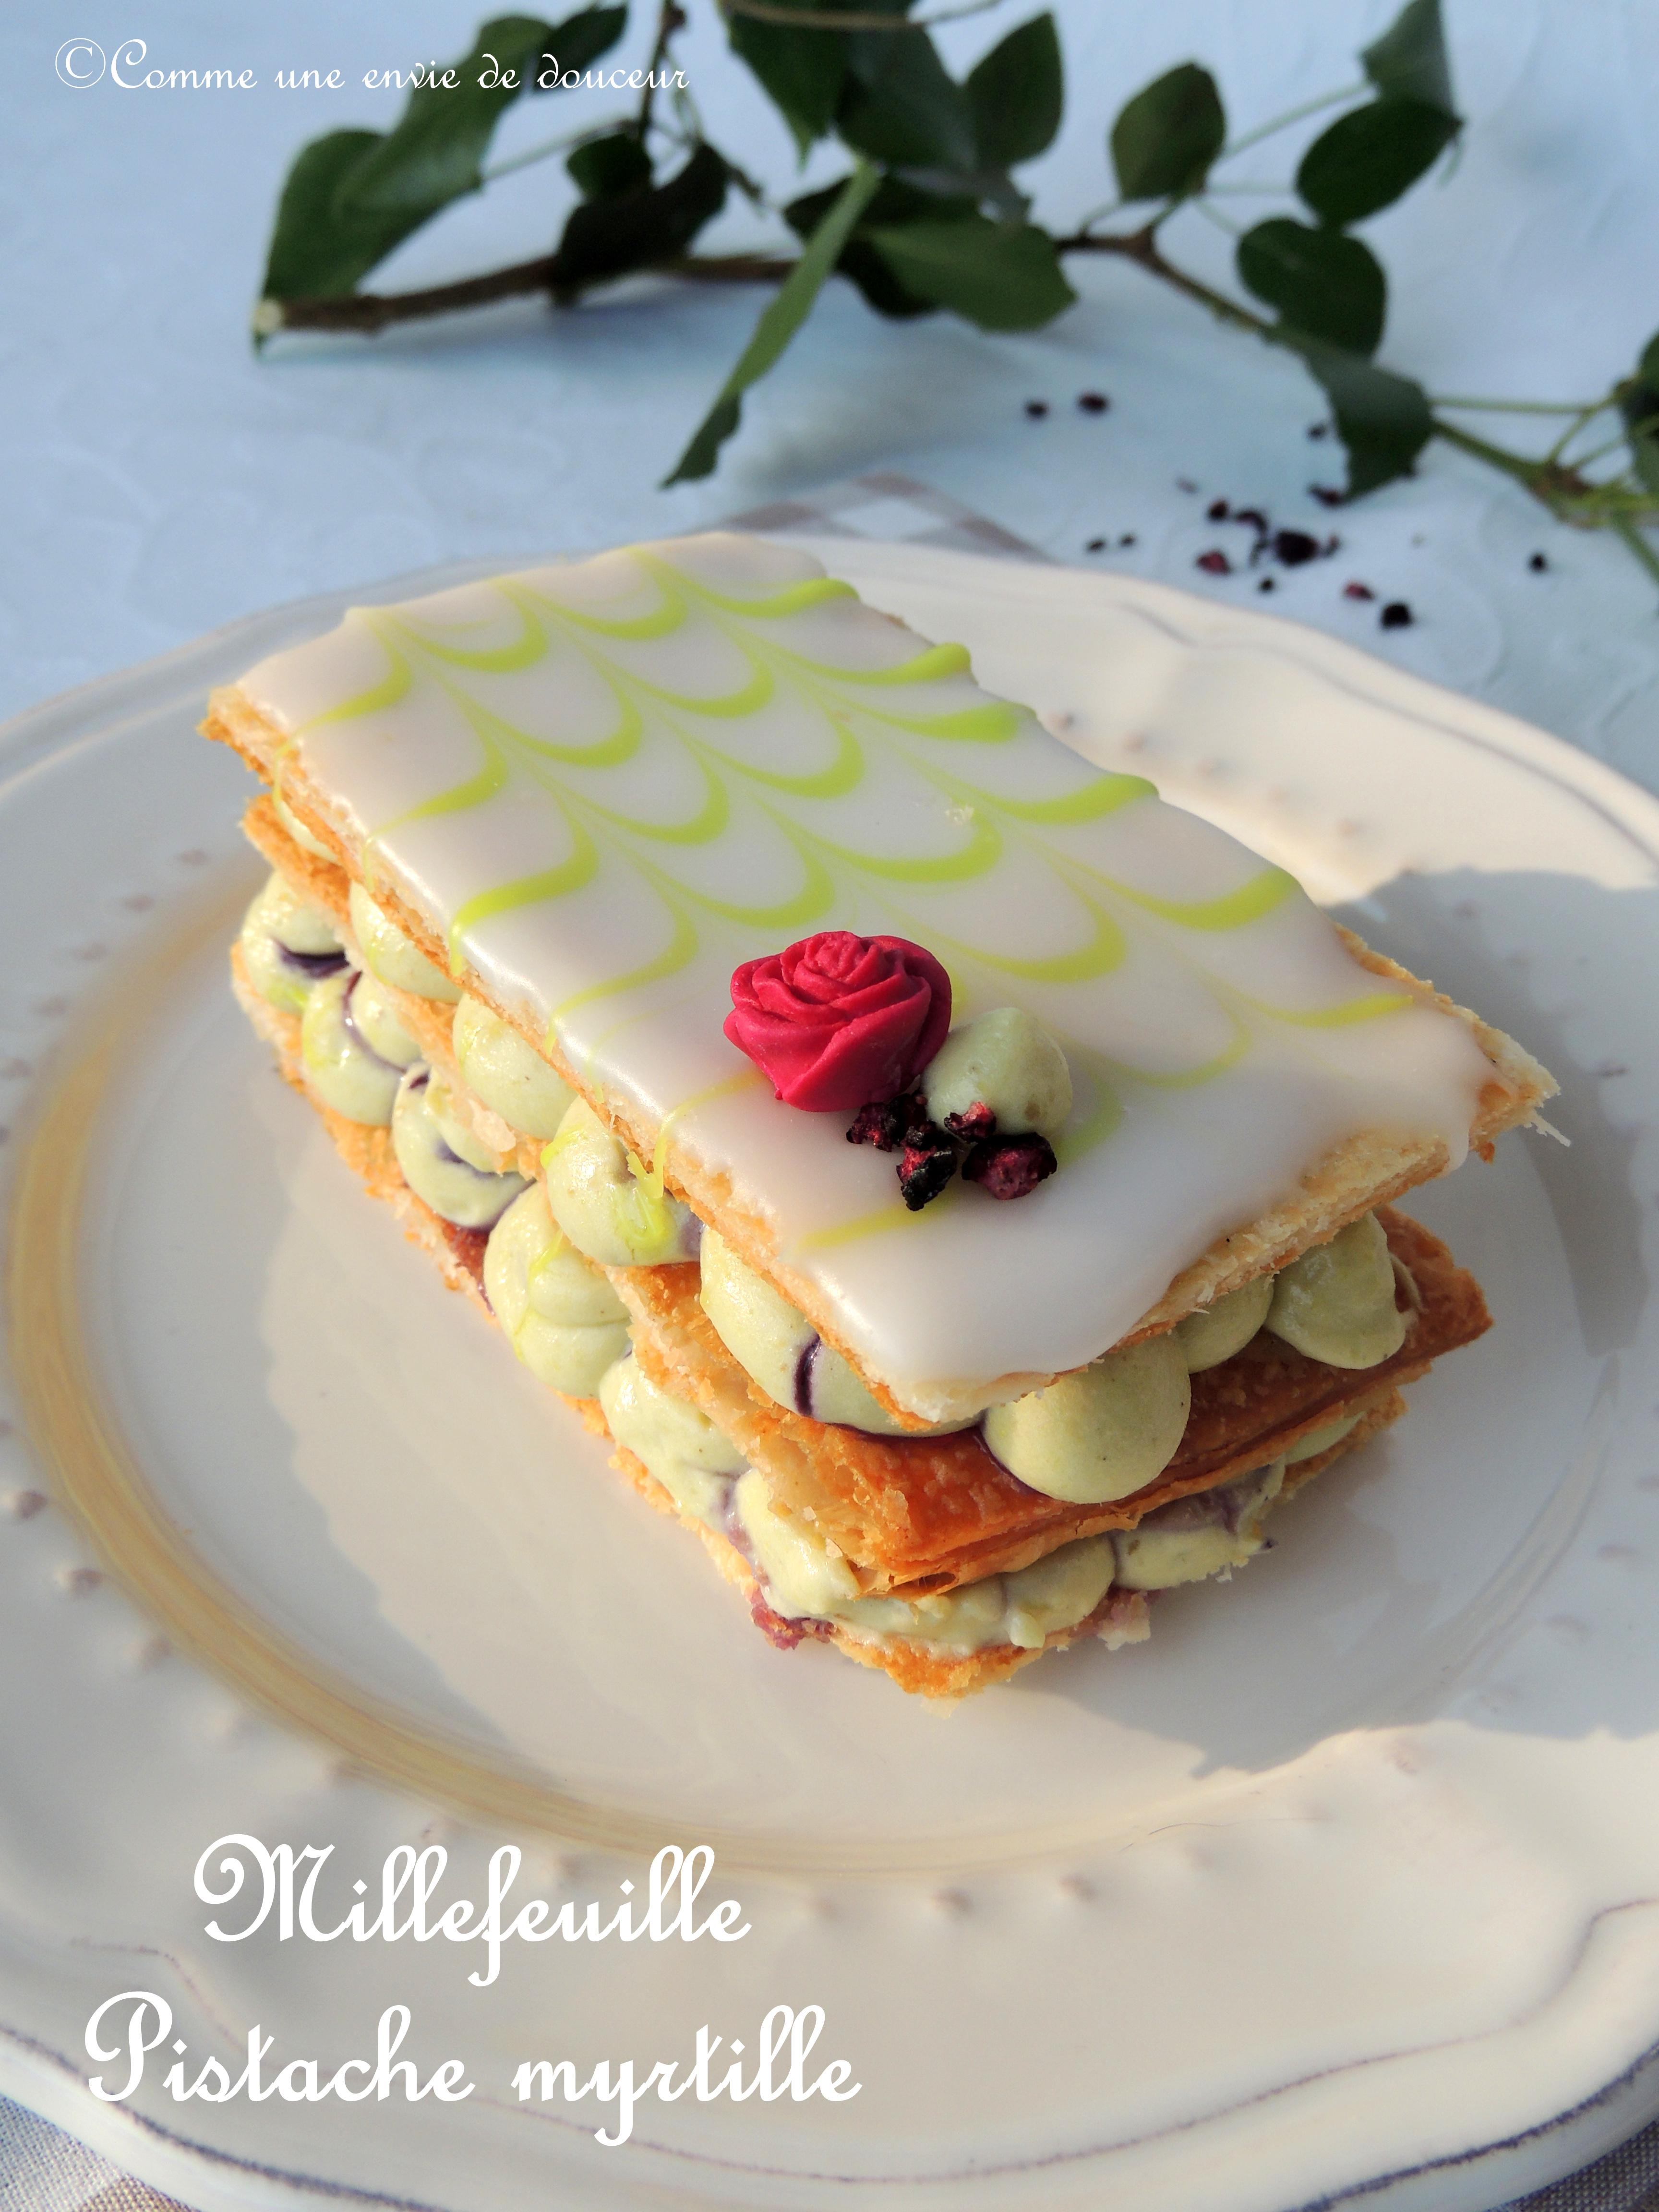 Millefeuille pistache myrtille – Pistachio blueberry millefeuille